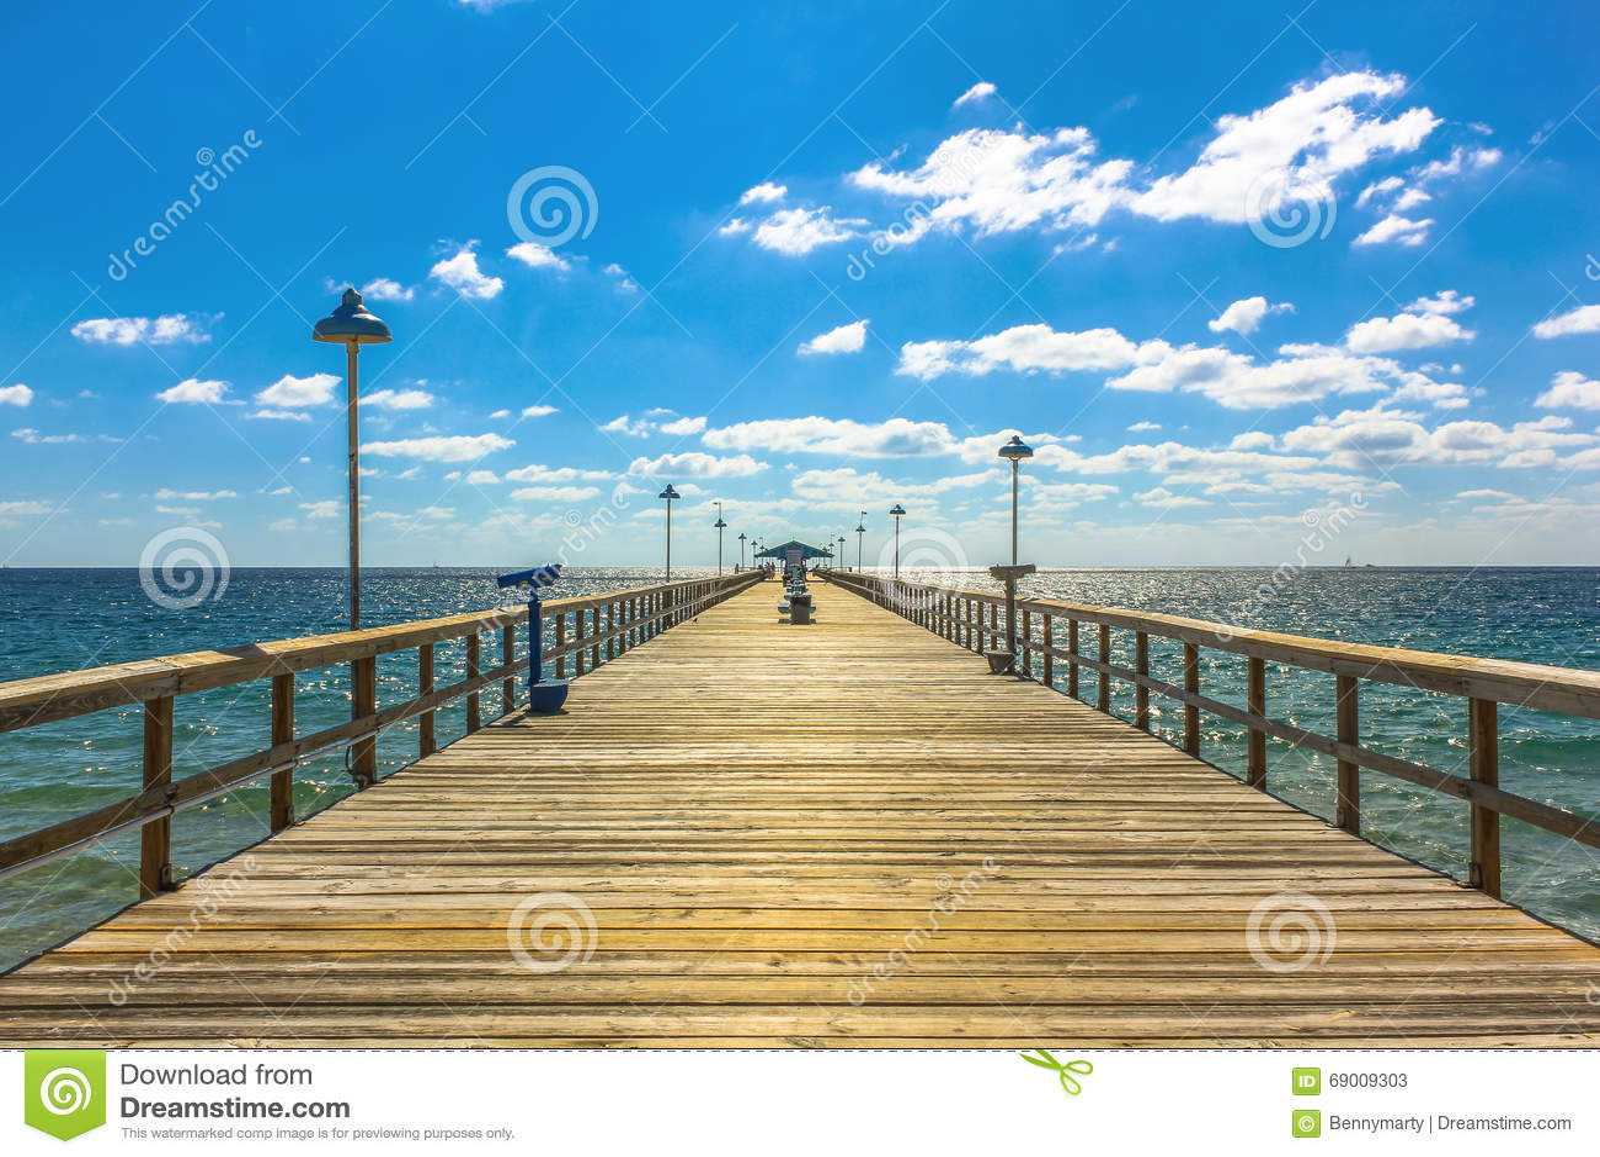 Fishing pier royalty free stock image for Florida free fishing days